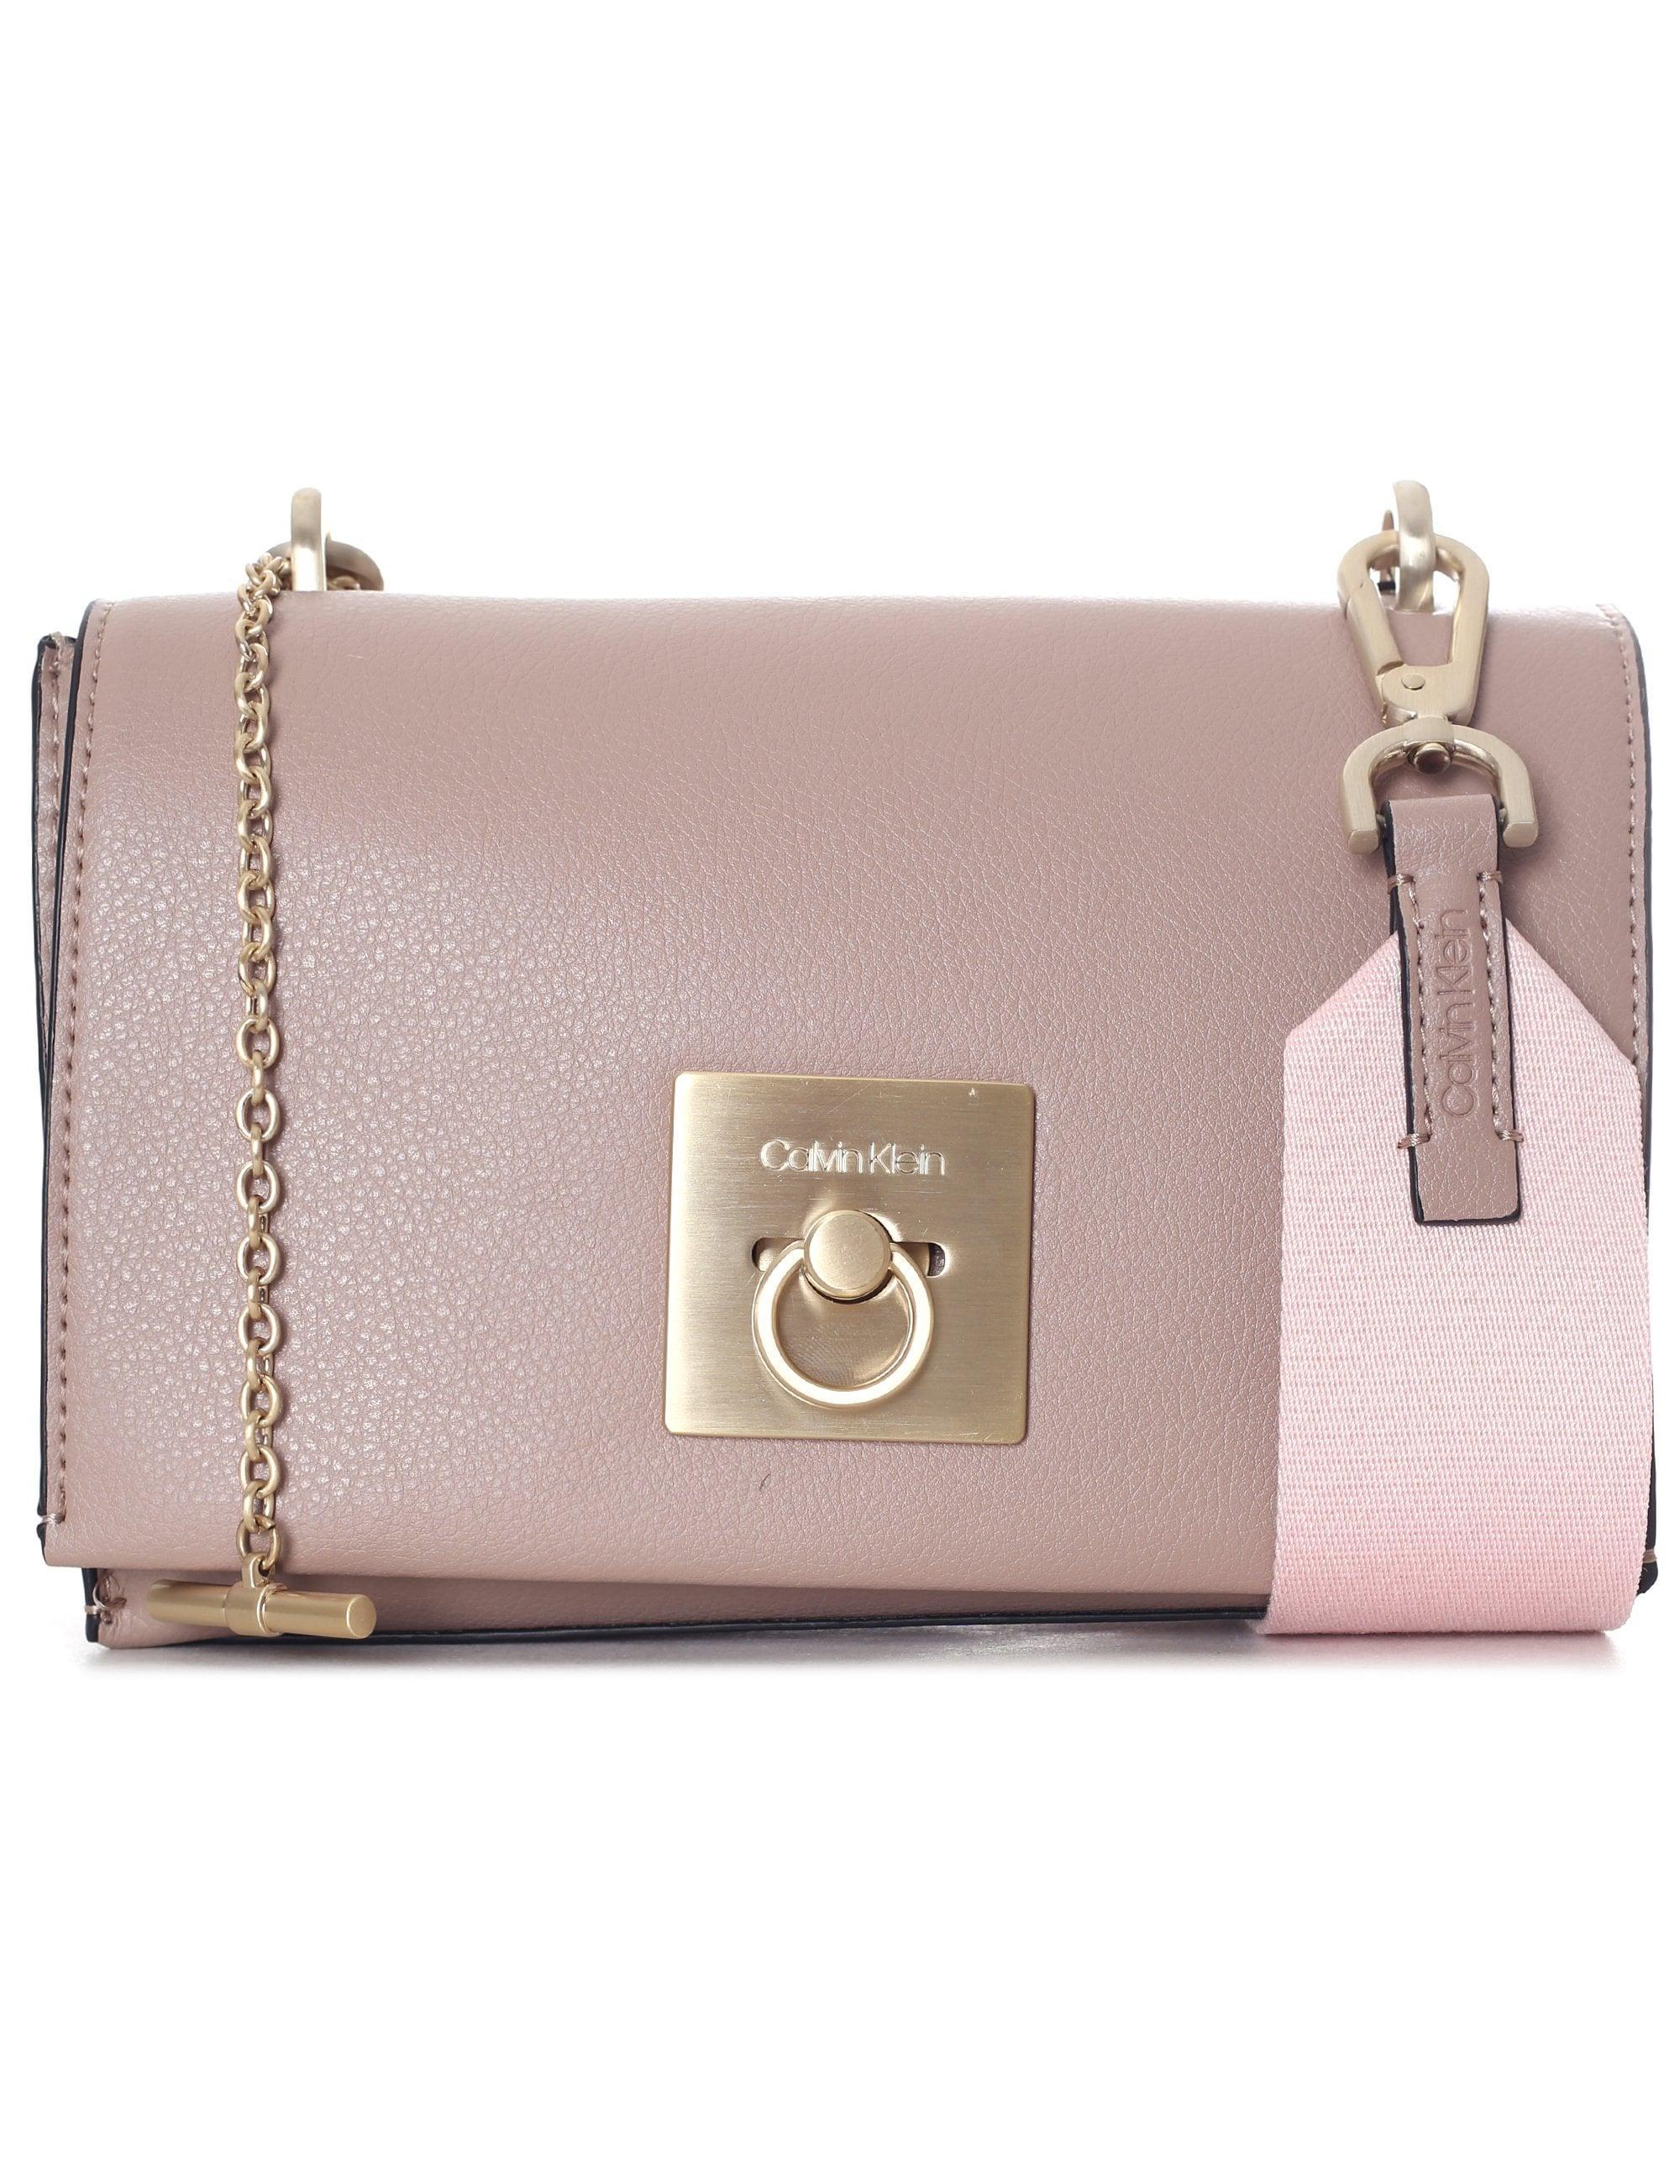 1c36ac83aec Calvin Klein Ck Lock Medium Flap Crossbody Bag in Brown - Lyst